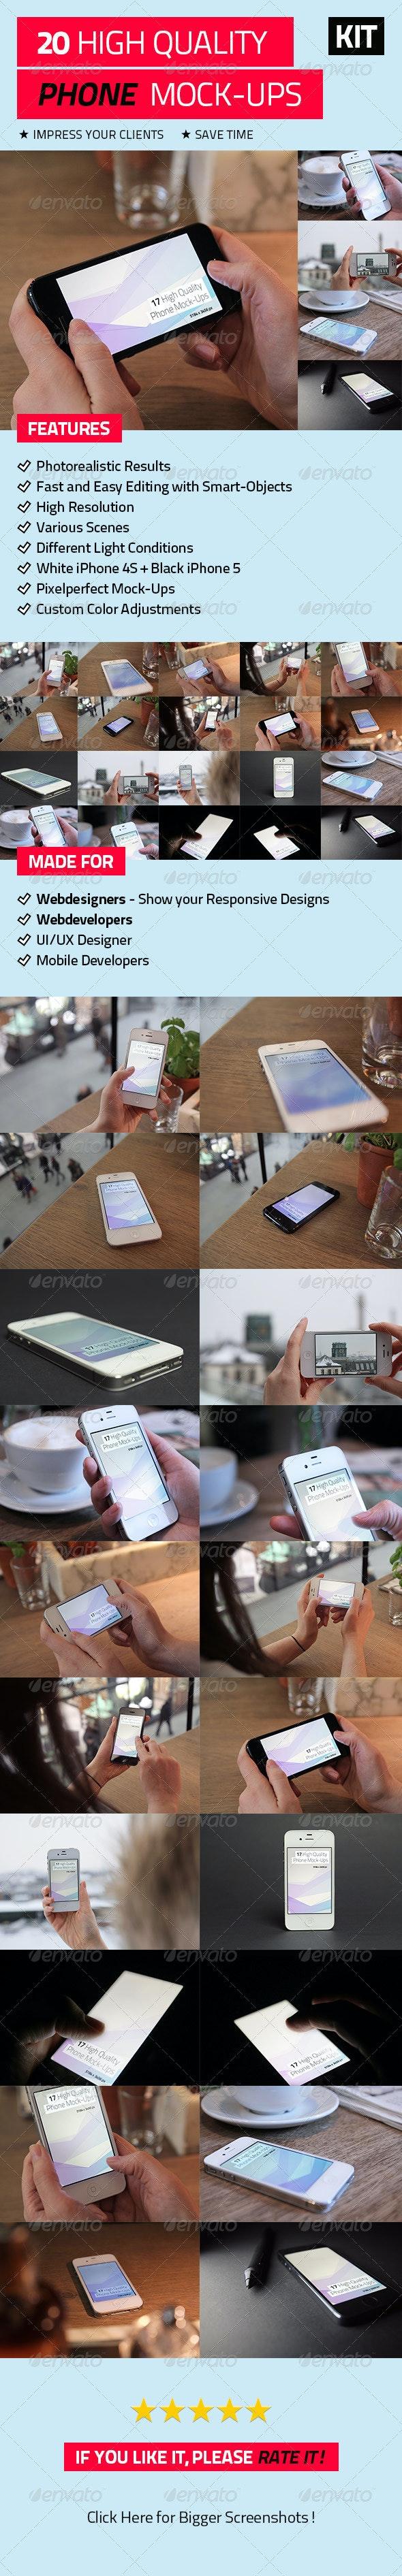 20 High Quality Phone Mock-Ups - Mobile Displays